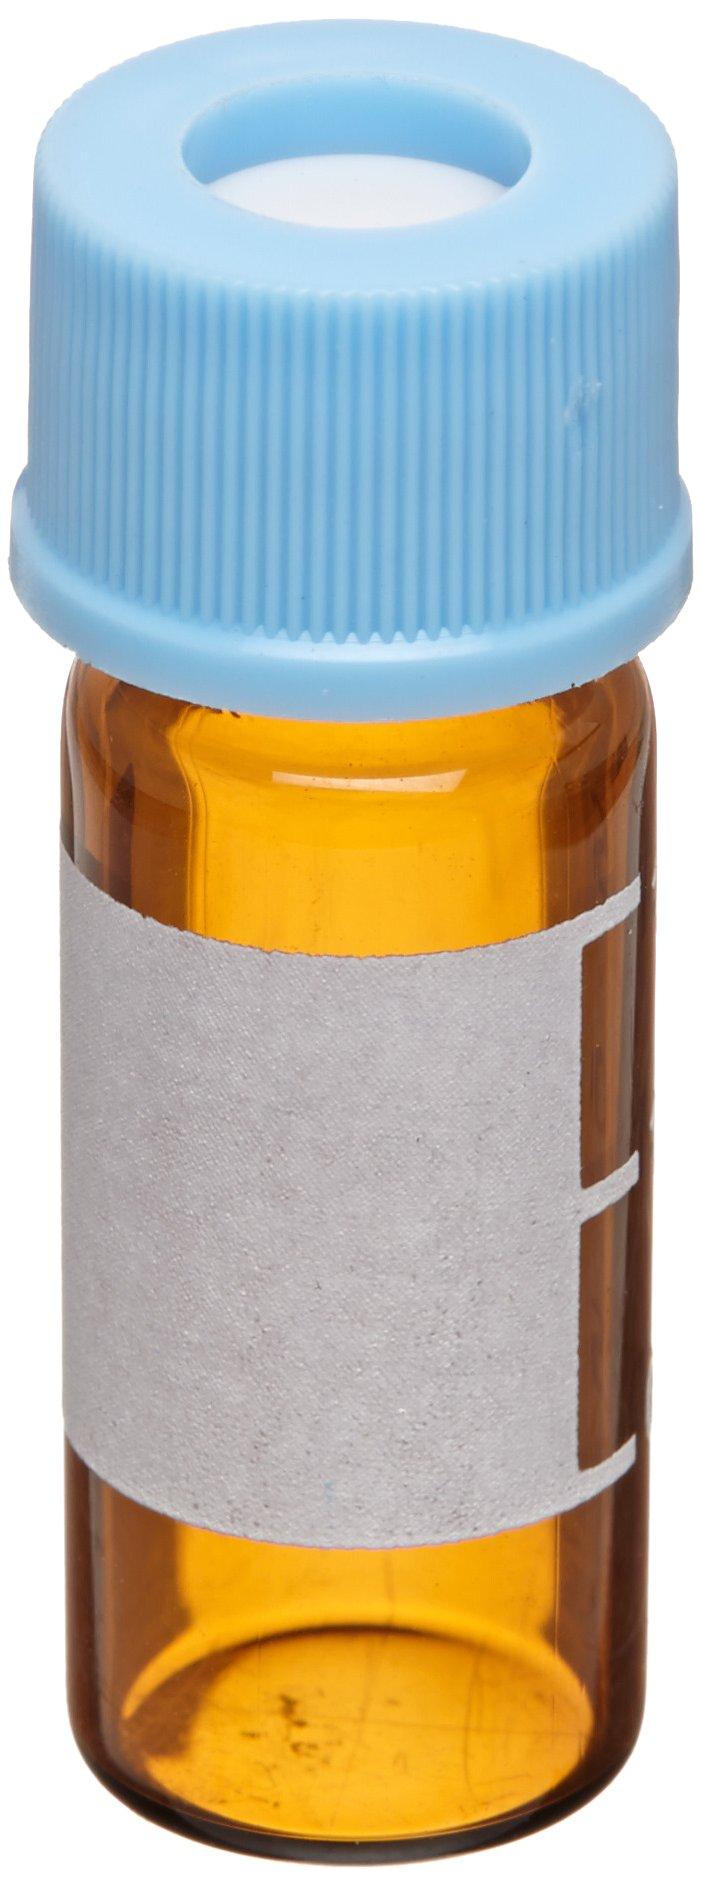 National Scientific Target 10-425 Assembled Vial Kit, Amber, 2ml Capacity (Pack of 100)